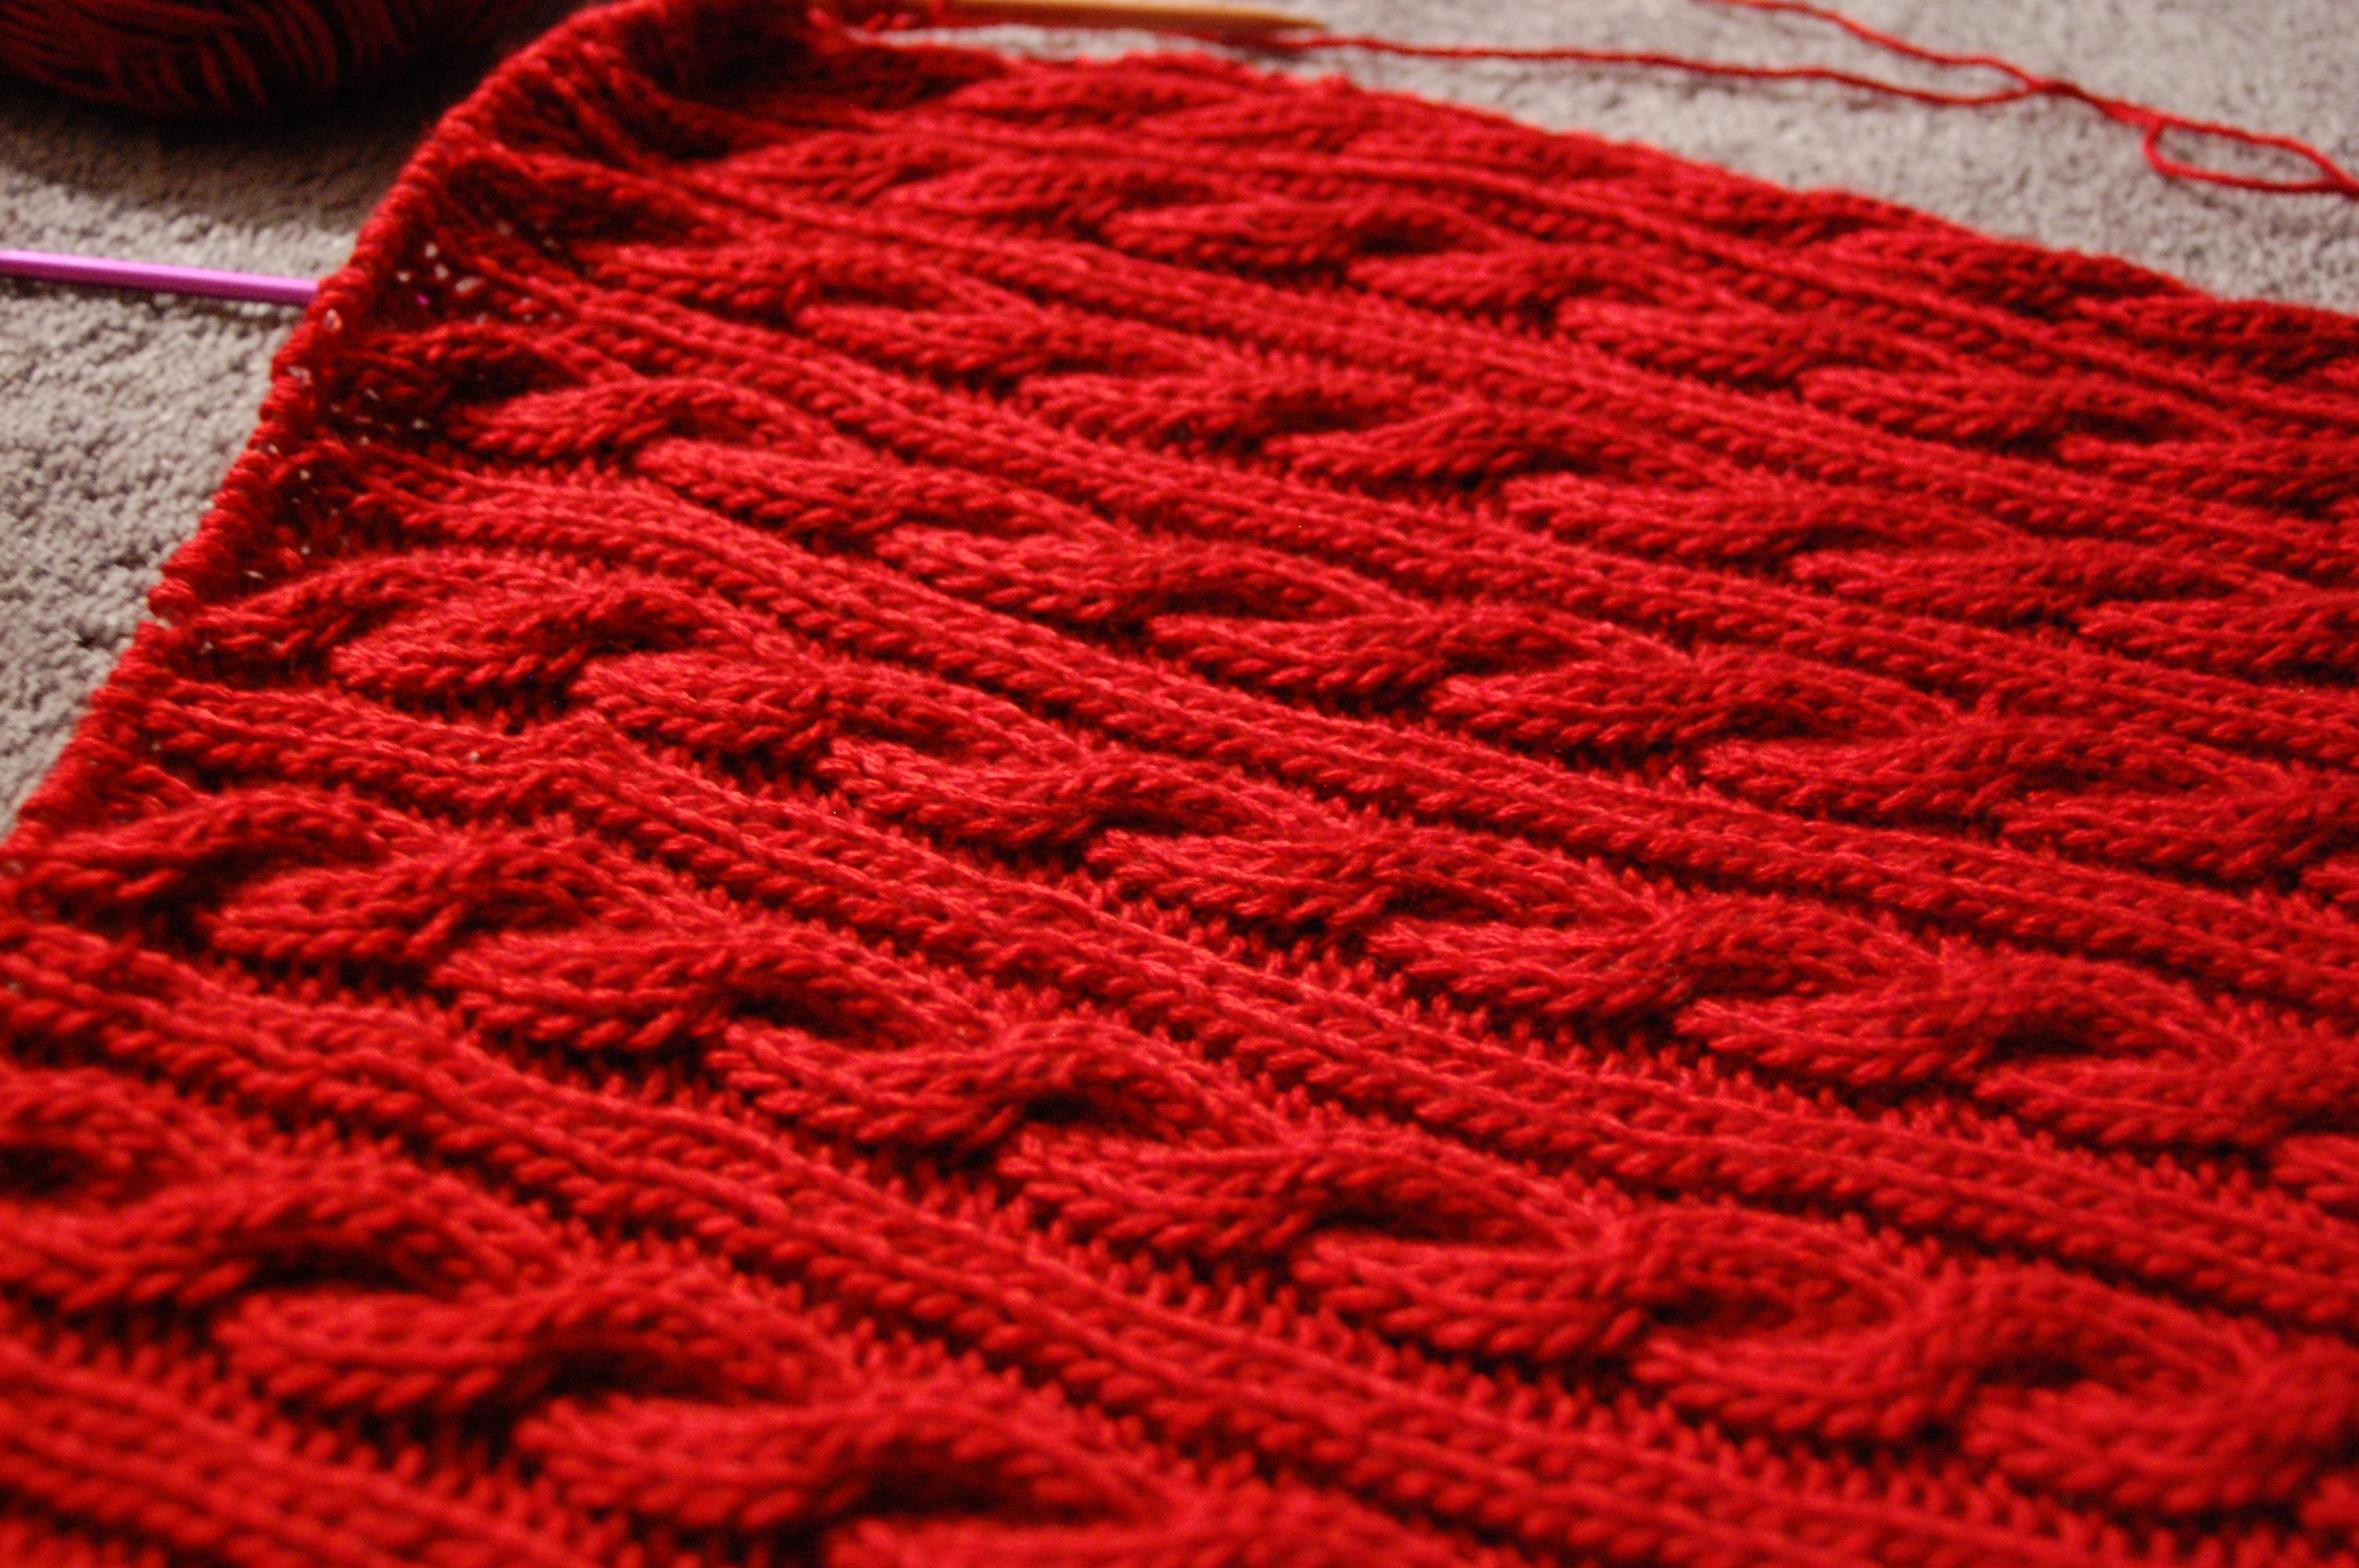 red-blanket-003